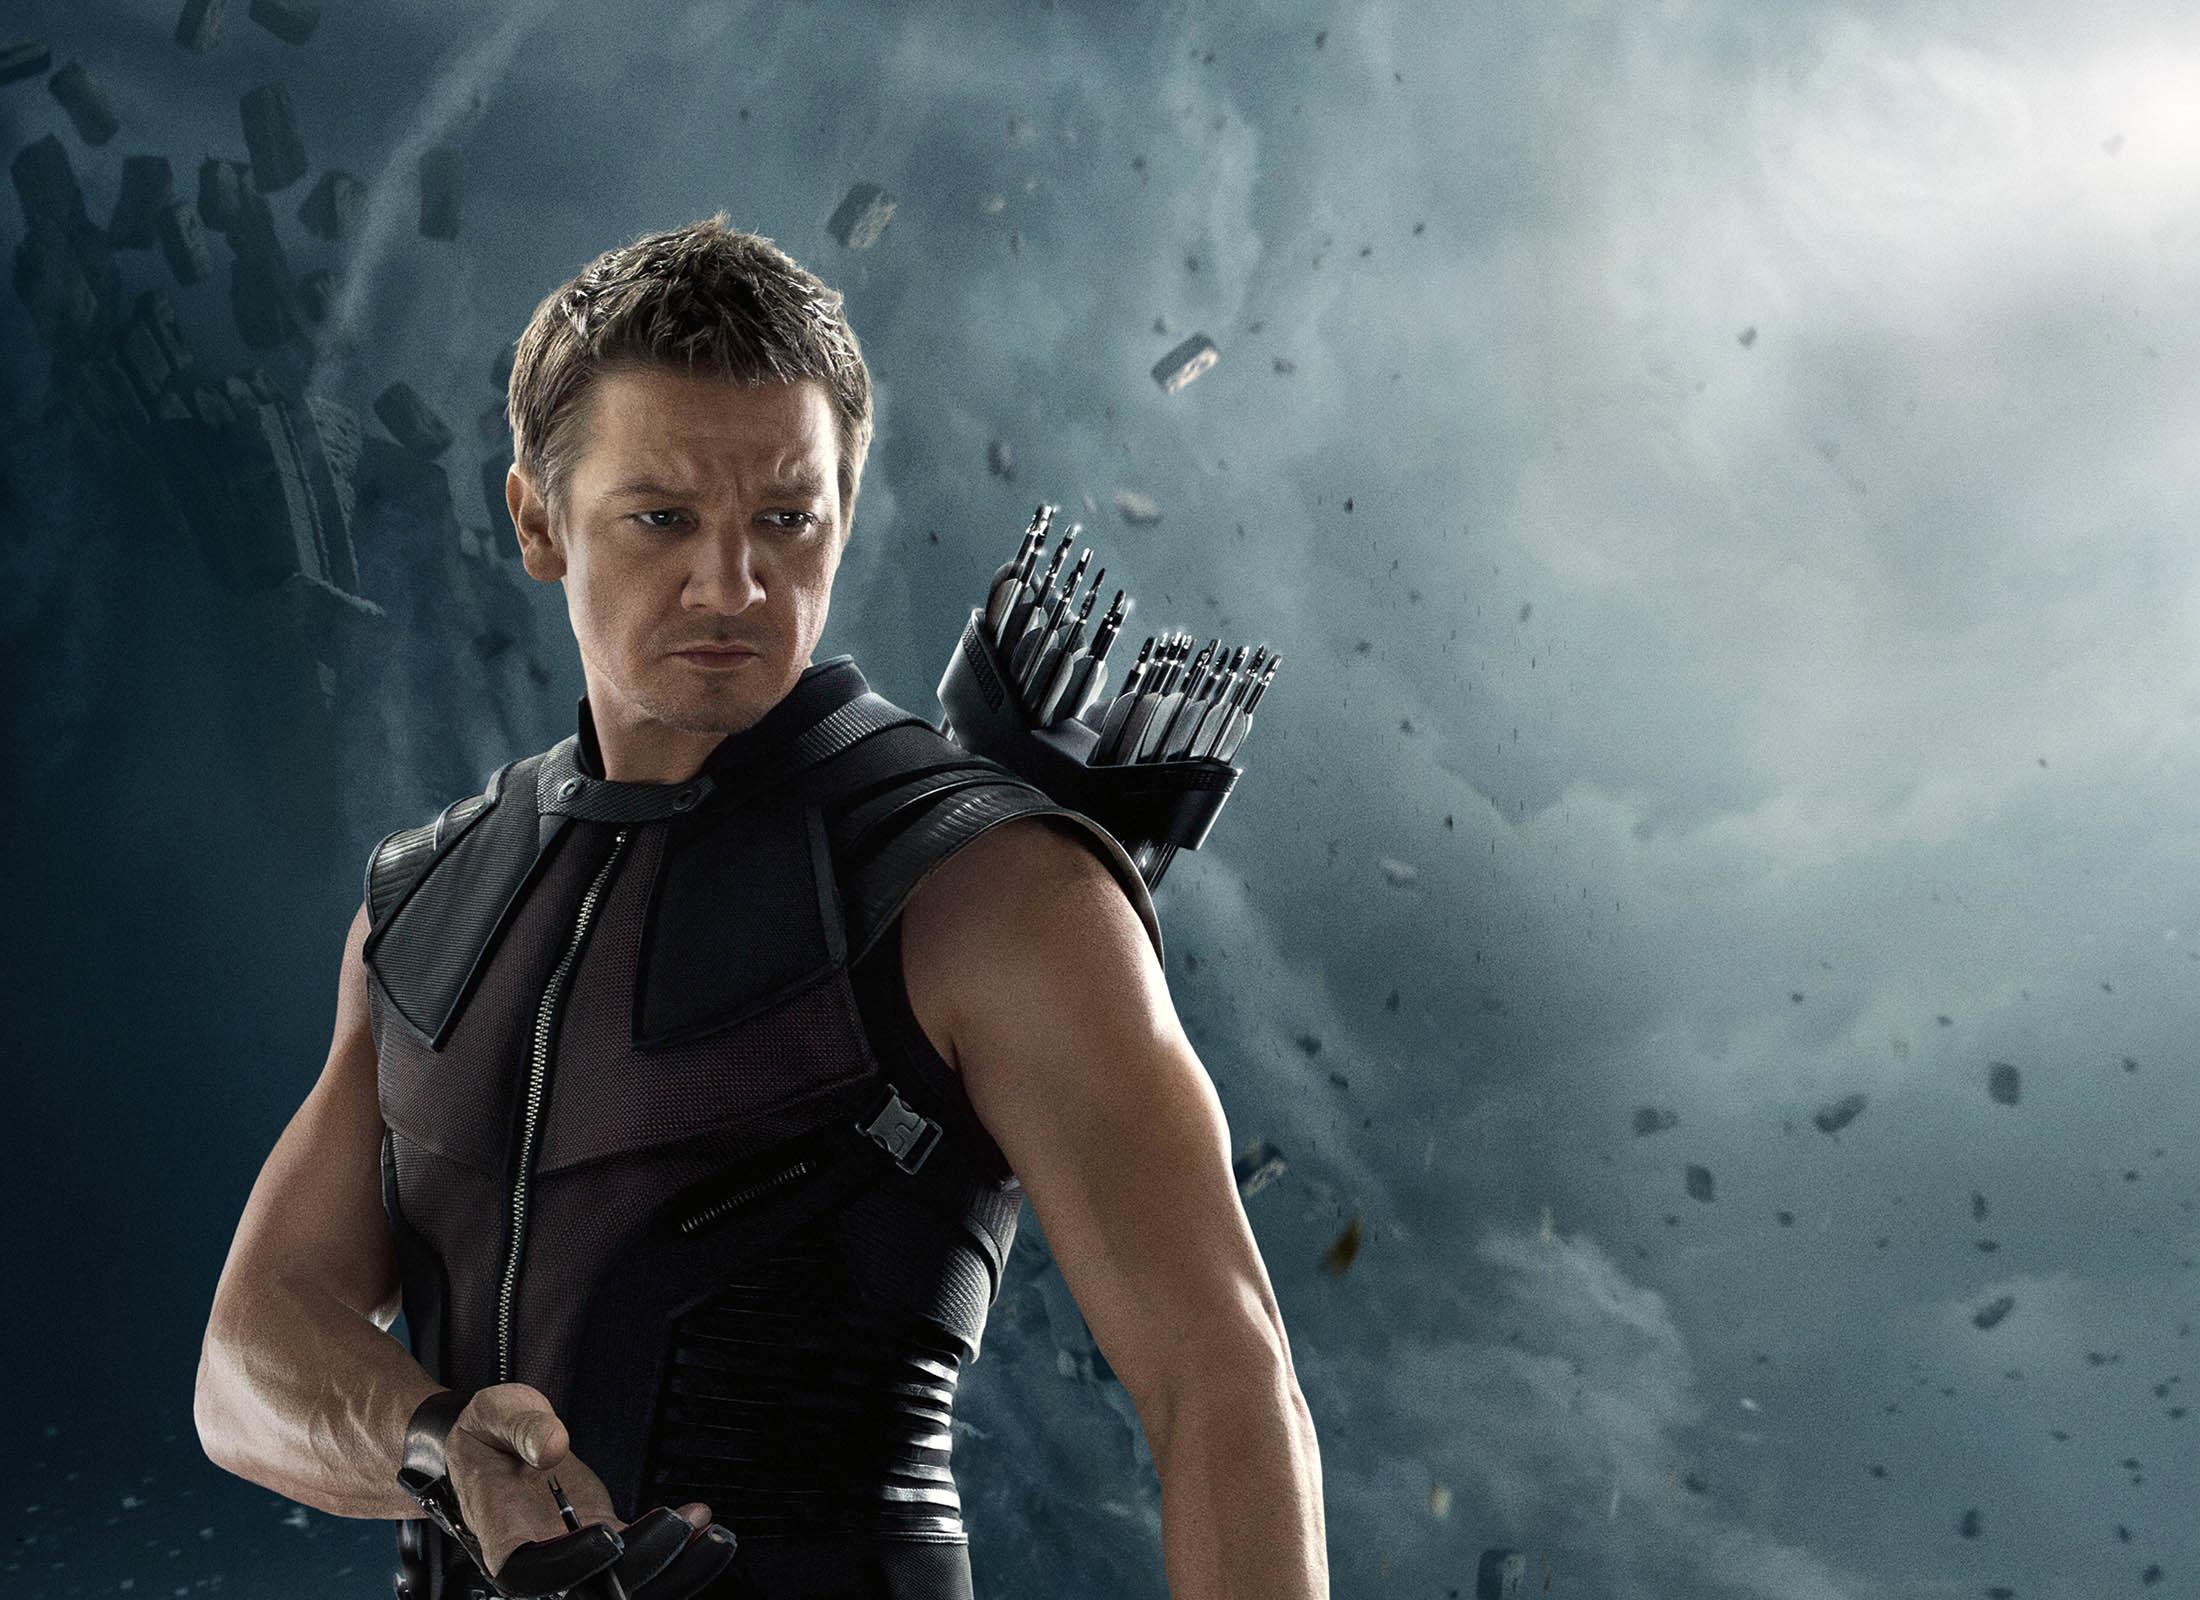 Hawkeye / Clint Barton – Avengers: Age of Ultron wallpaper